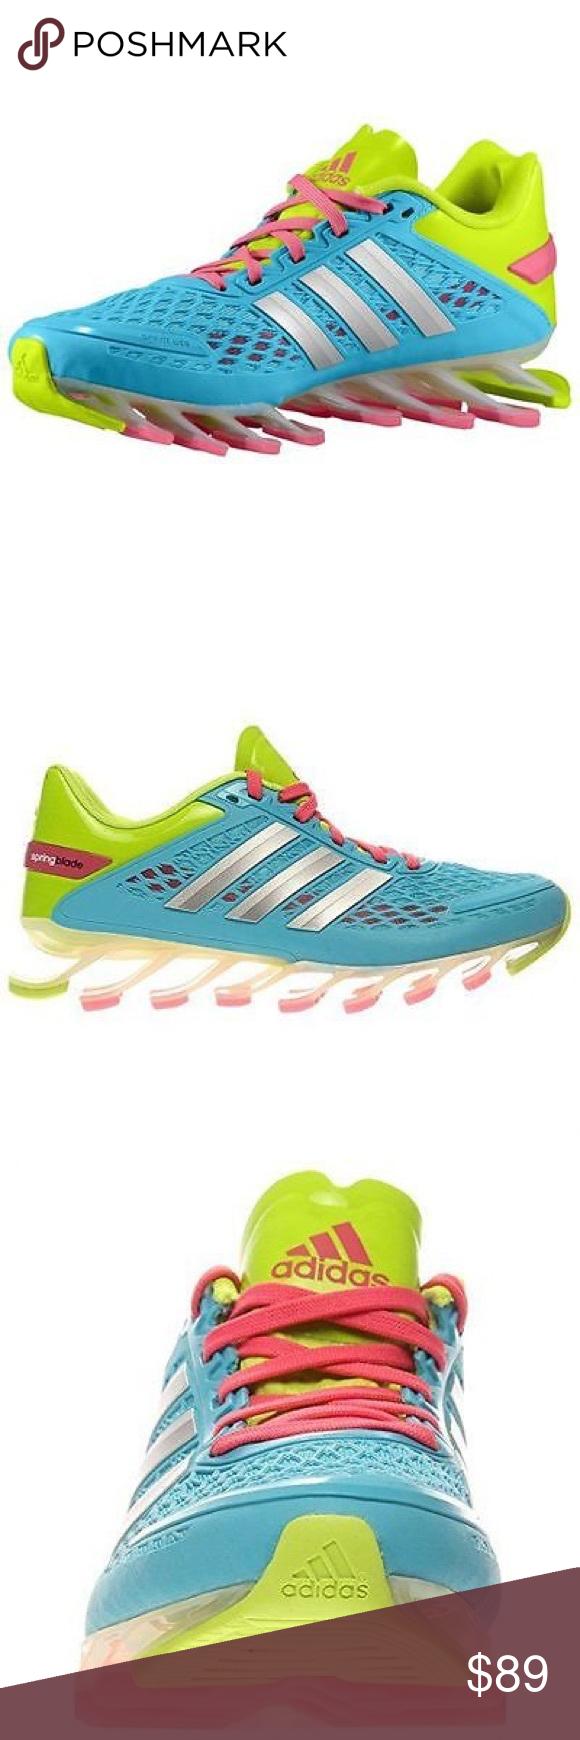 Adidas Women s Razor Spring blade Running Shoe Break New Ground in these  Adidas Spring Blade Razor cd17c94b4d